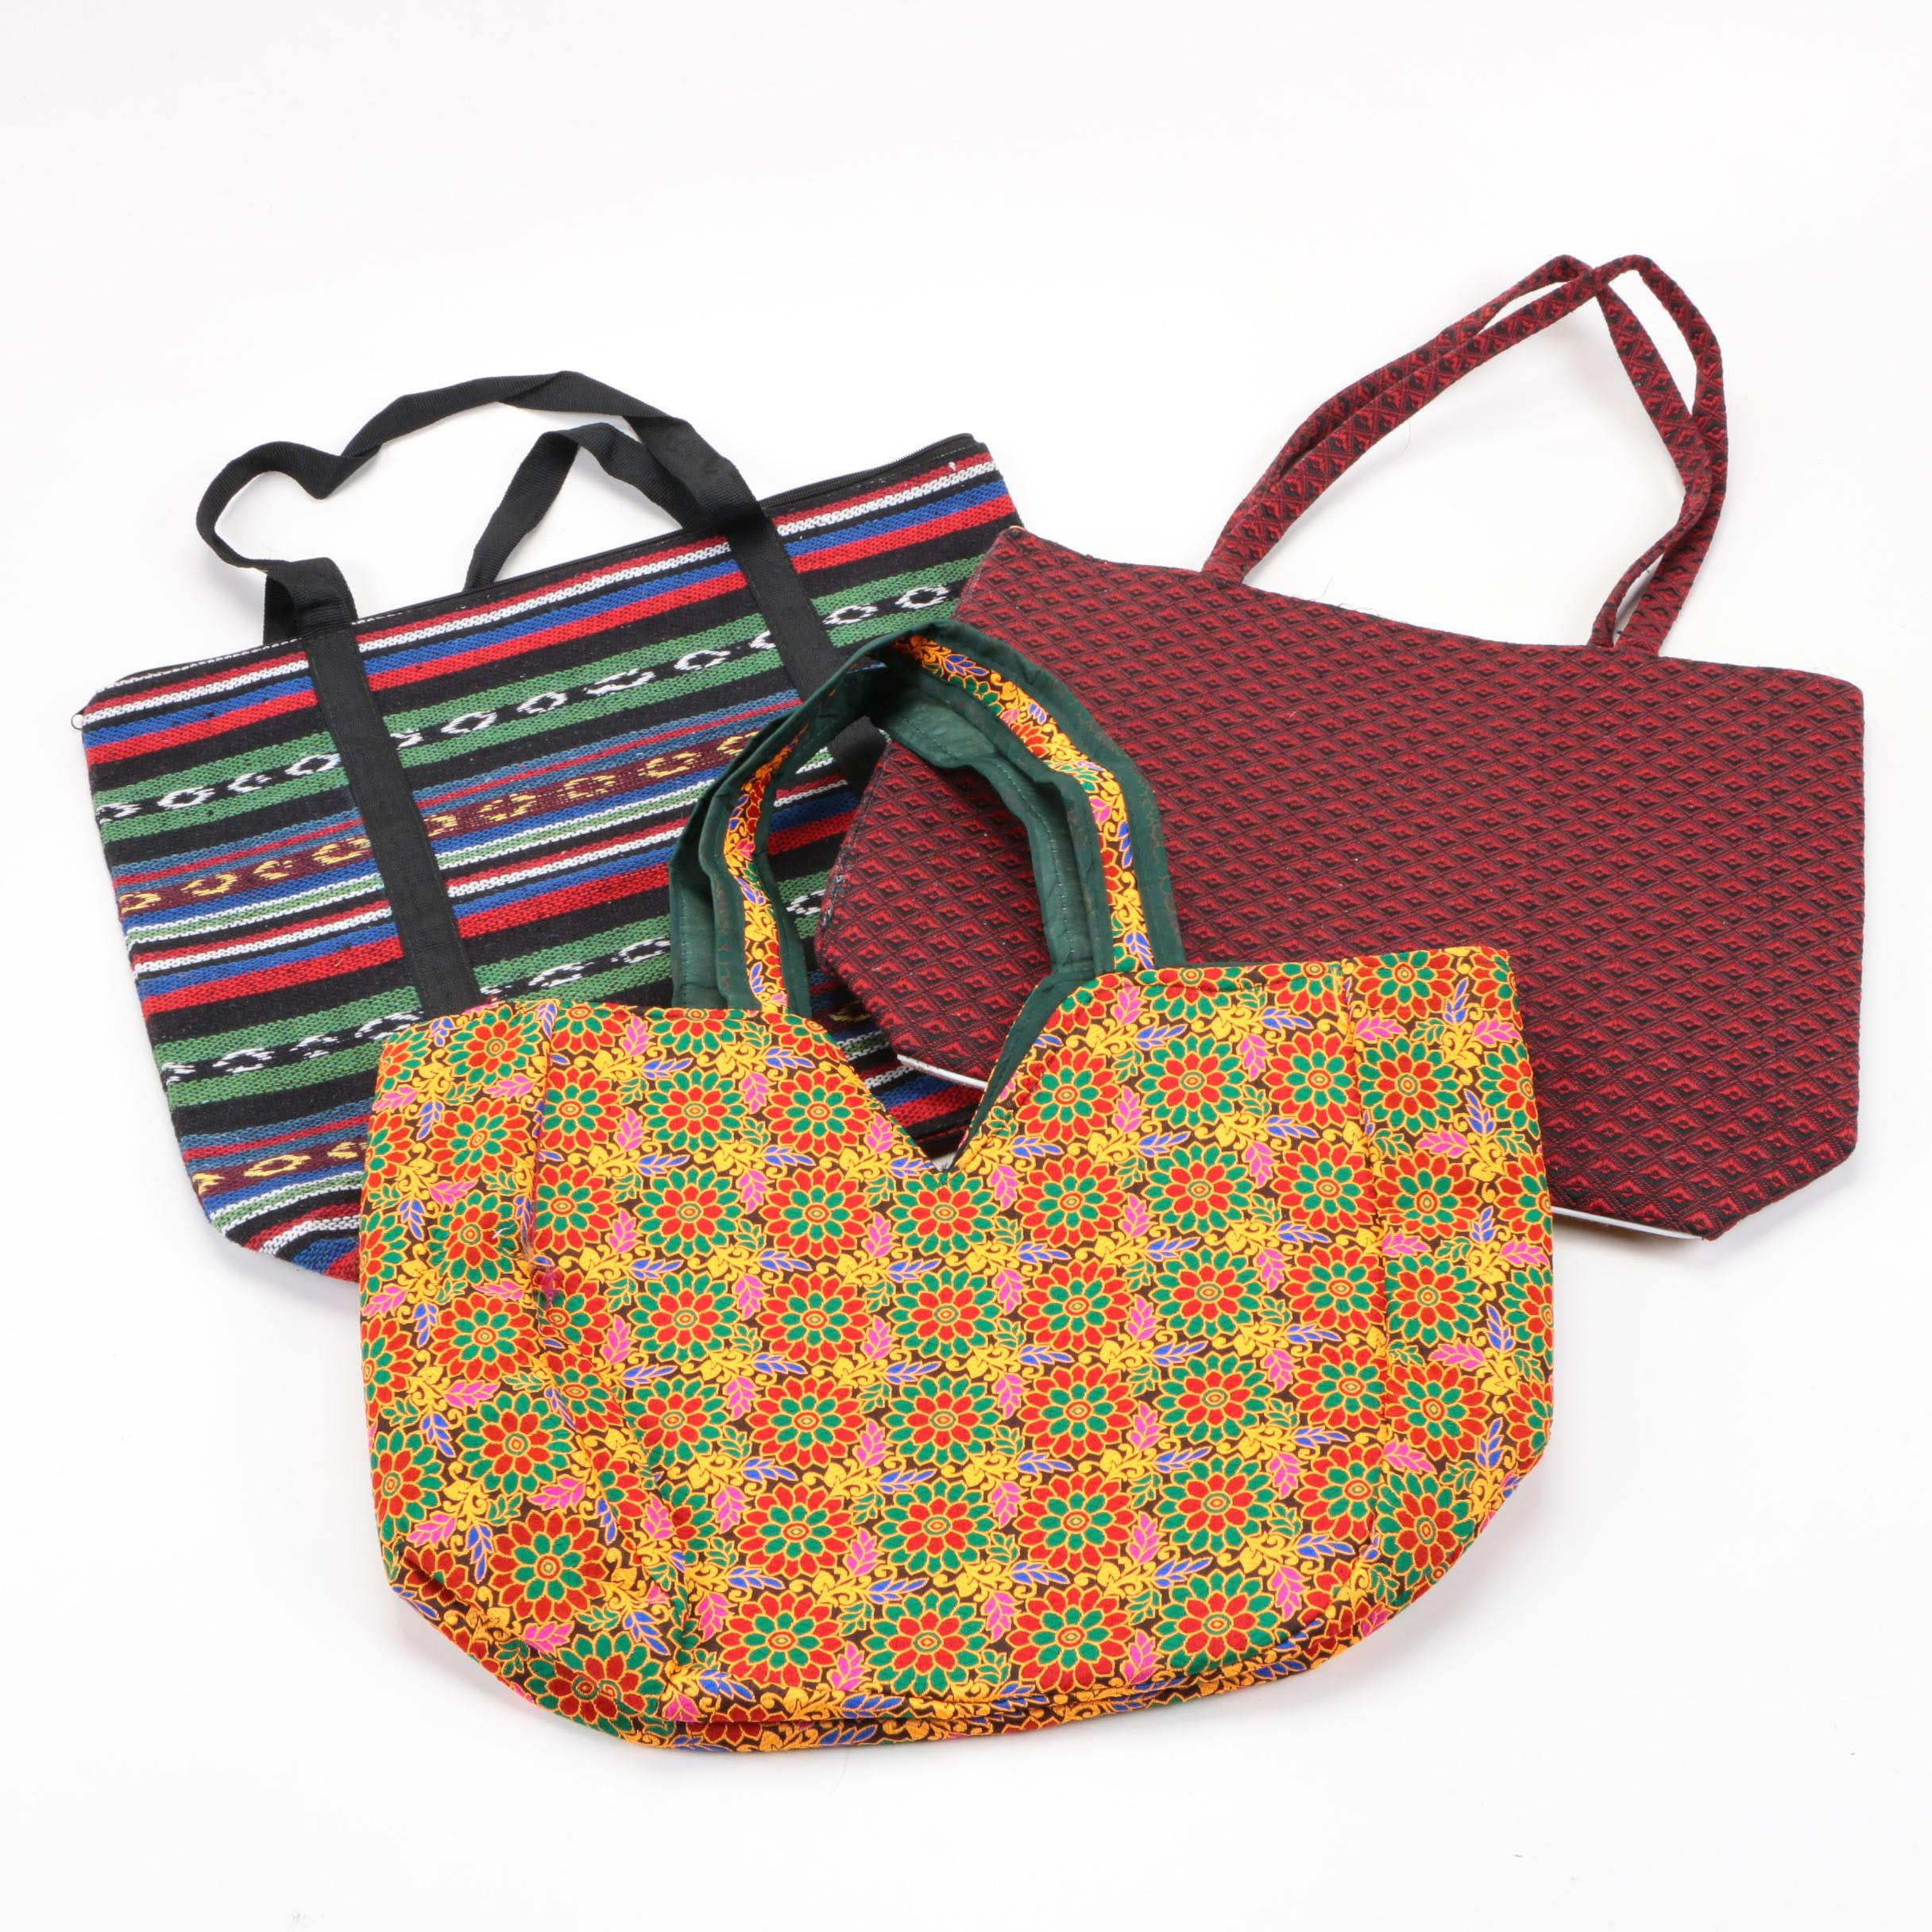 Three Cloth Tote Bags